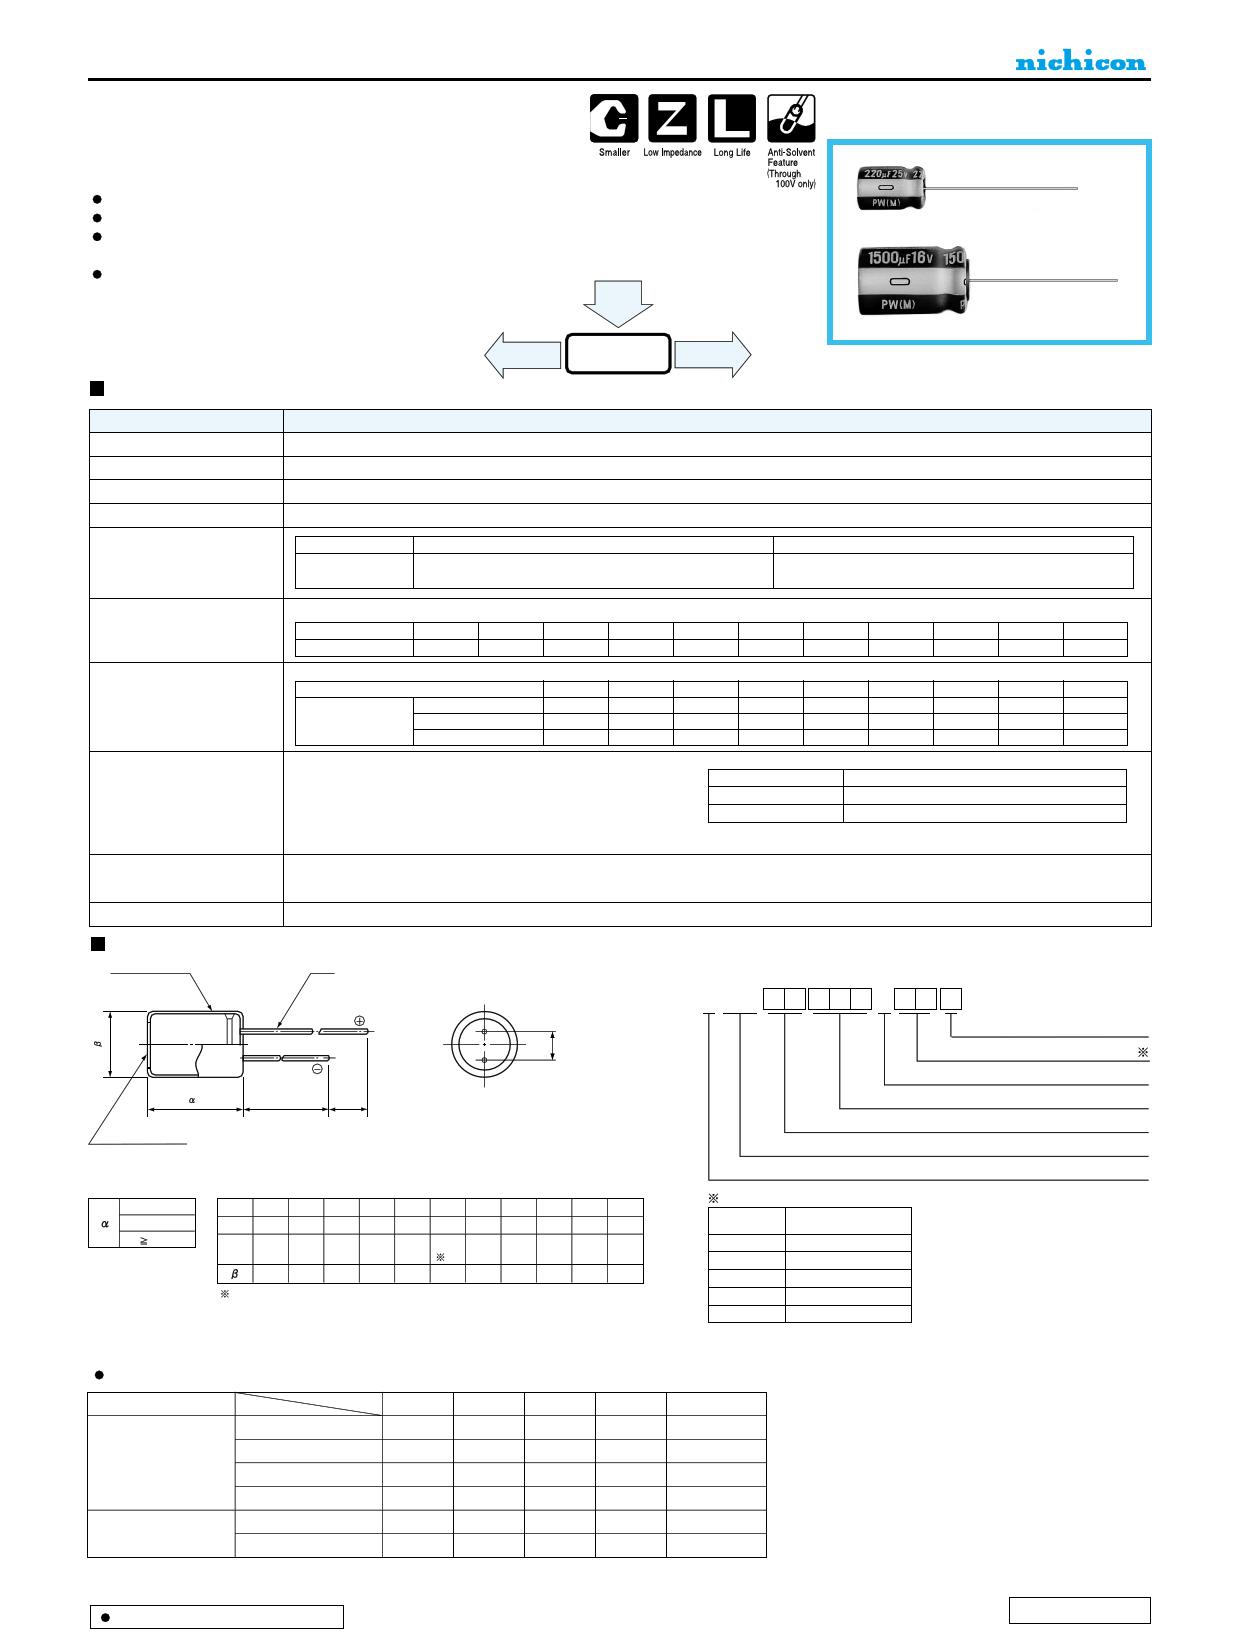 UPW2A102MHD 데이터시트 및 UPW2A102MHD PDF